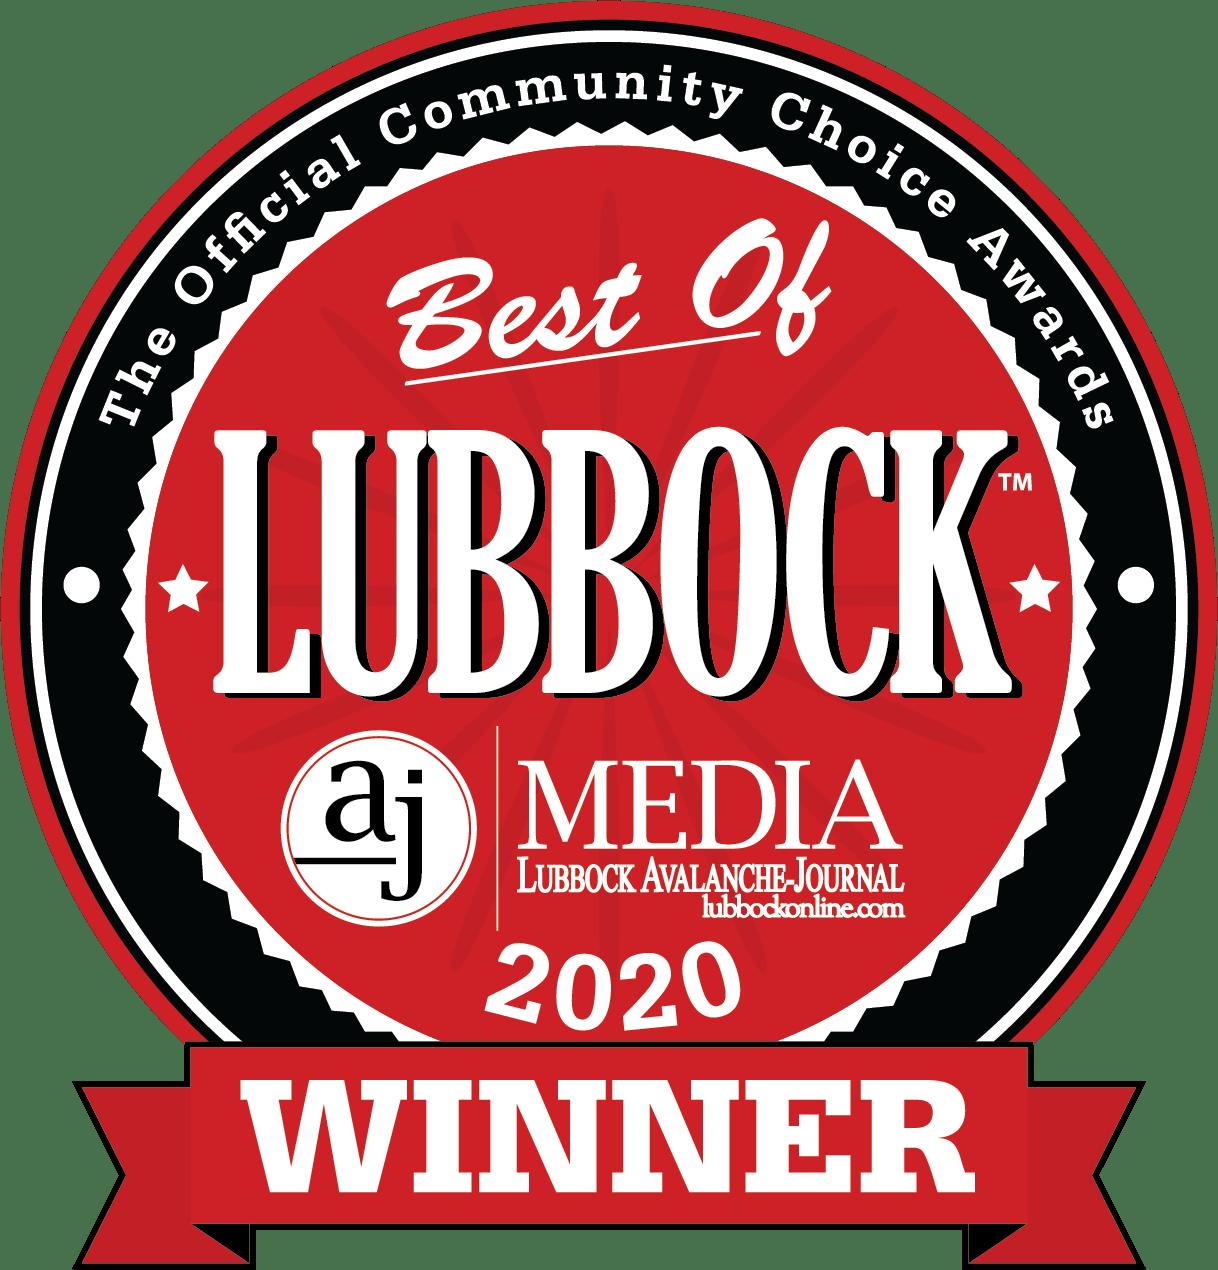 Best of Lubbock 2020